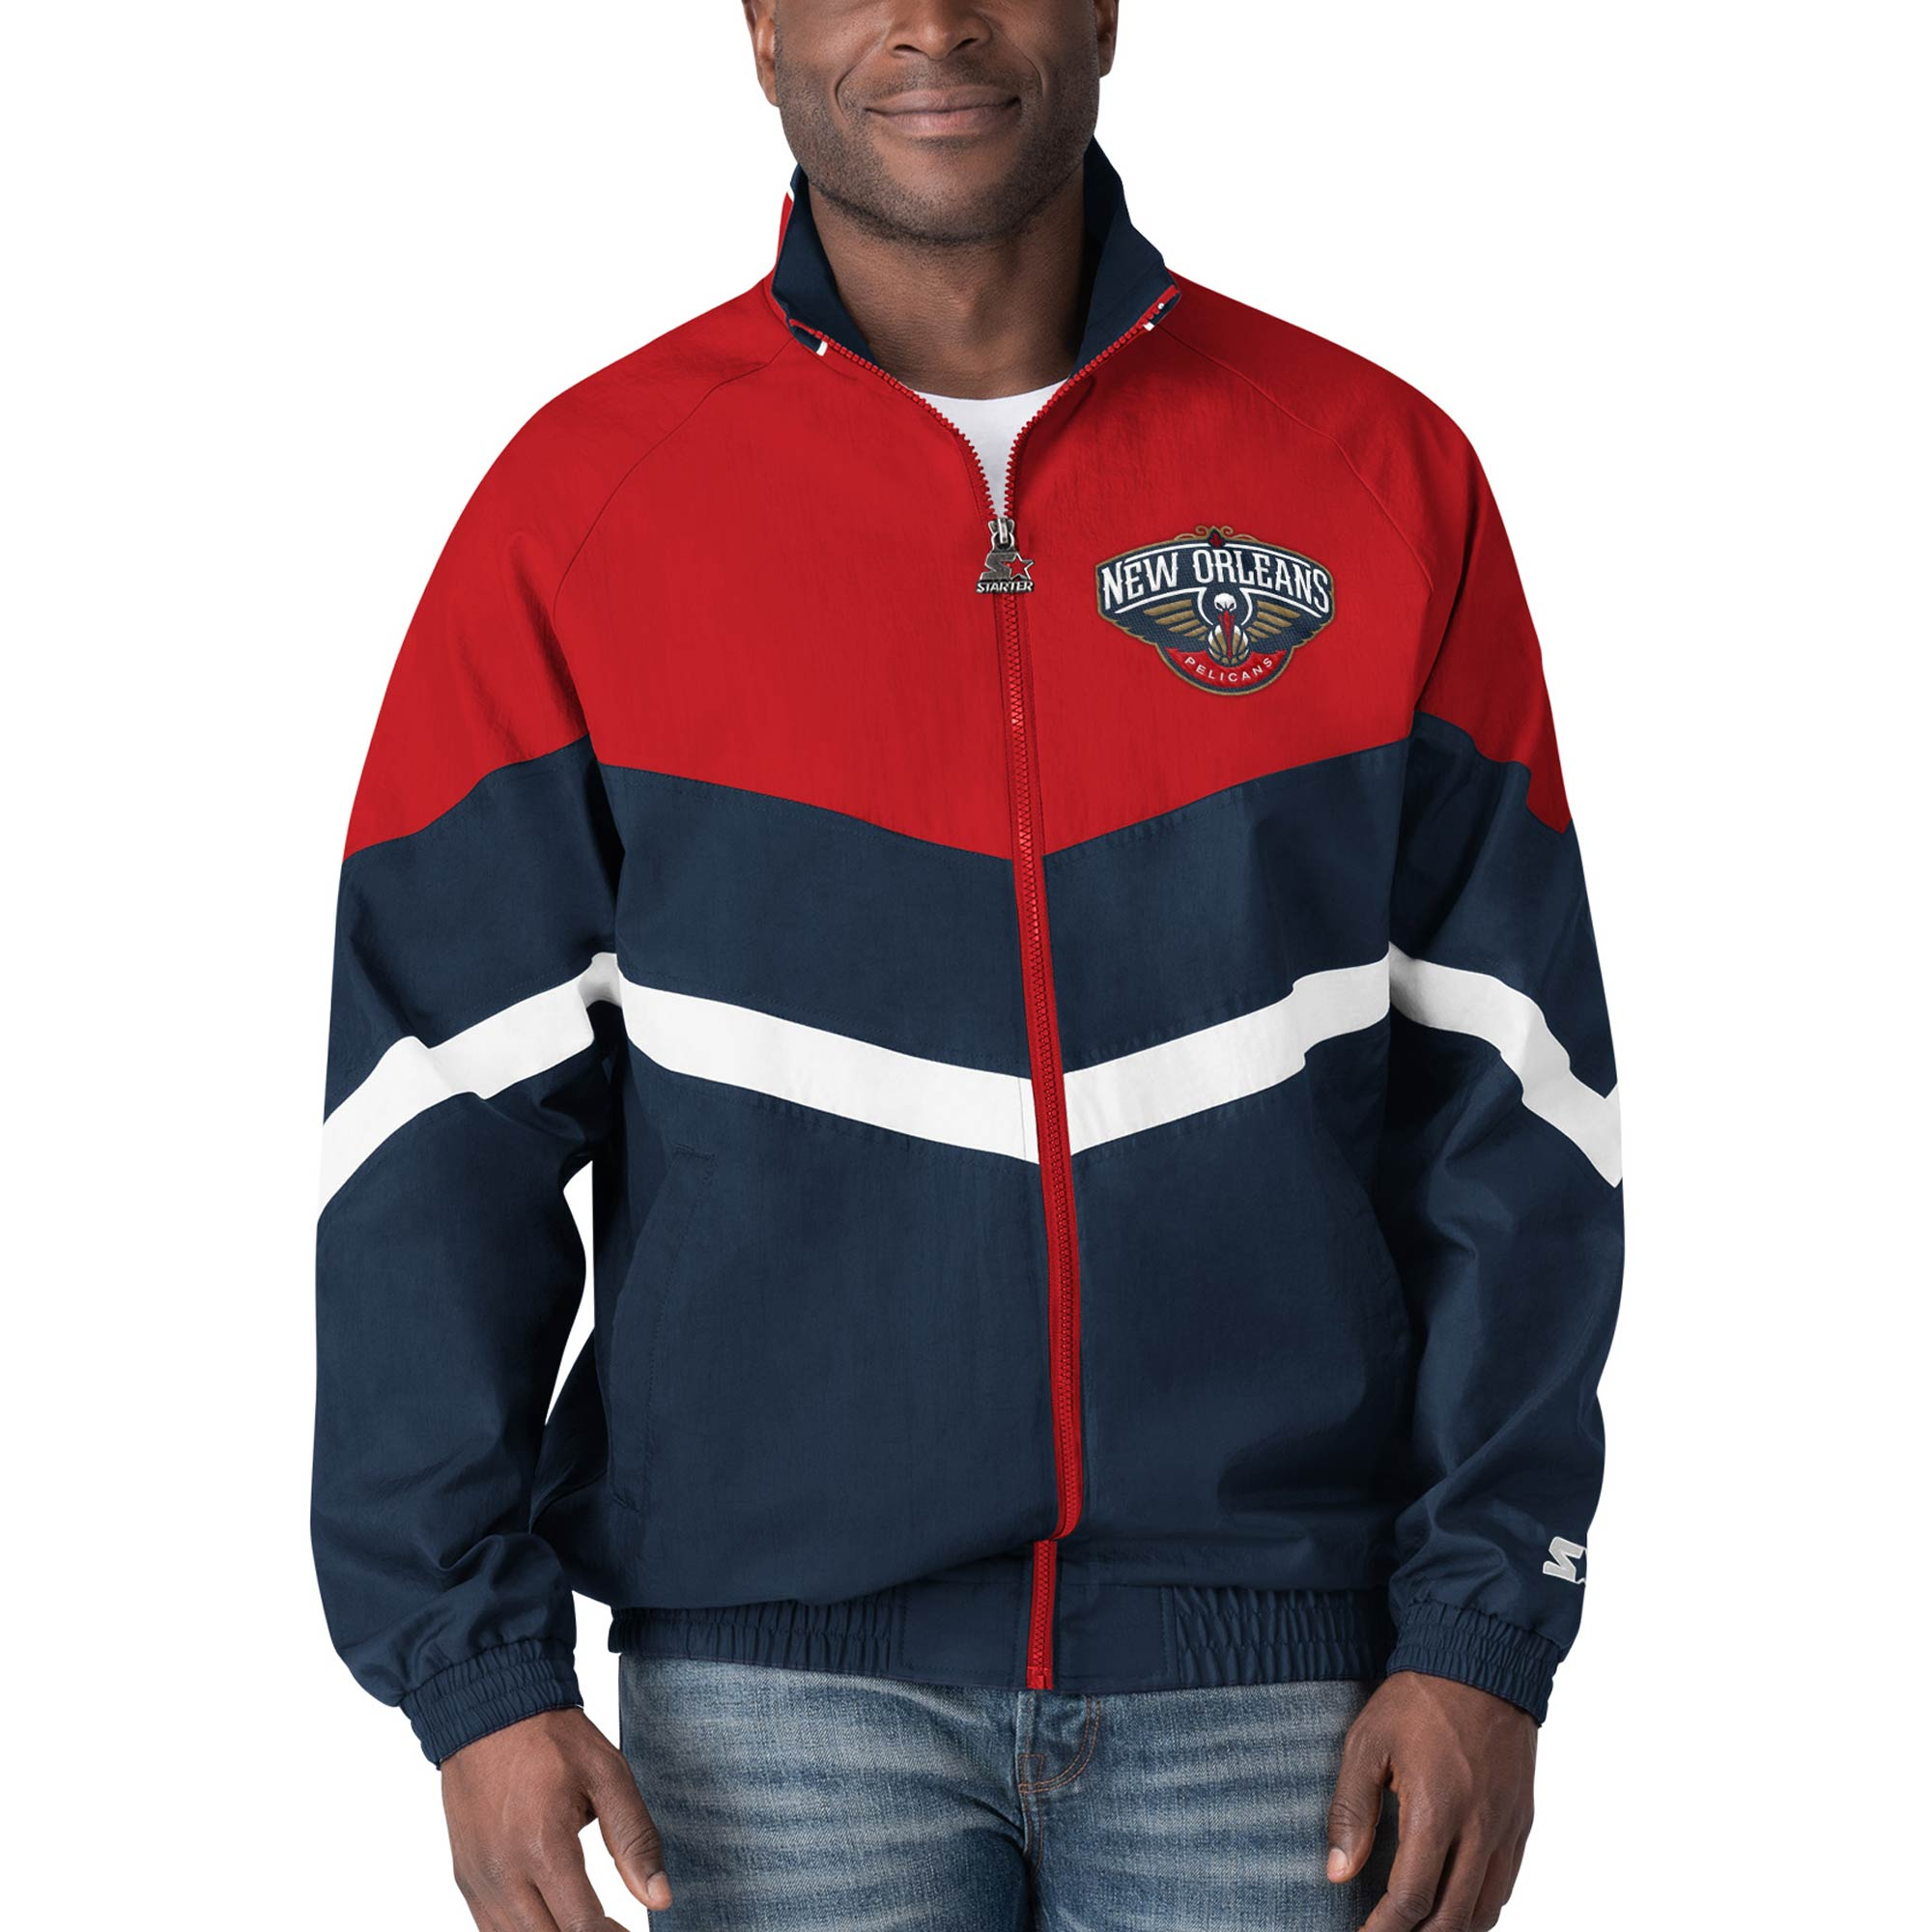 New Orleans Pelicans Starter Bank Shot Oxford Full-Zip Jacket - Navy/Red